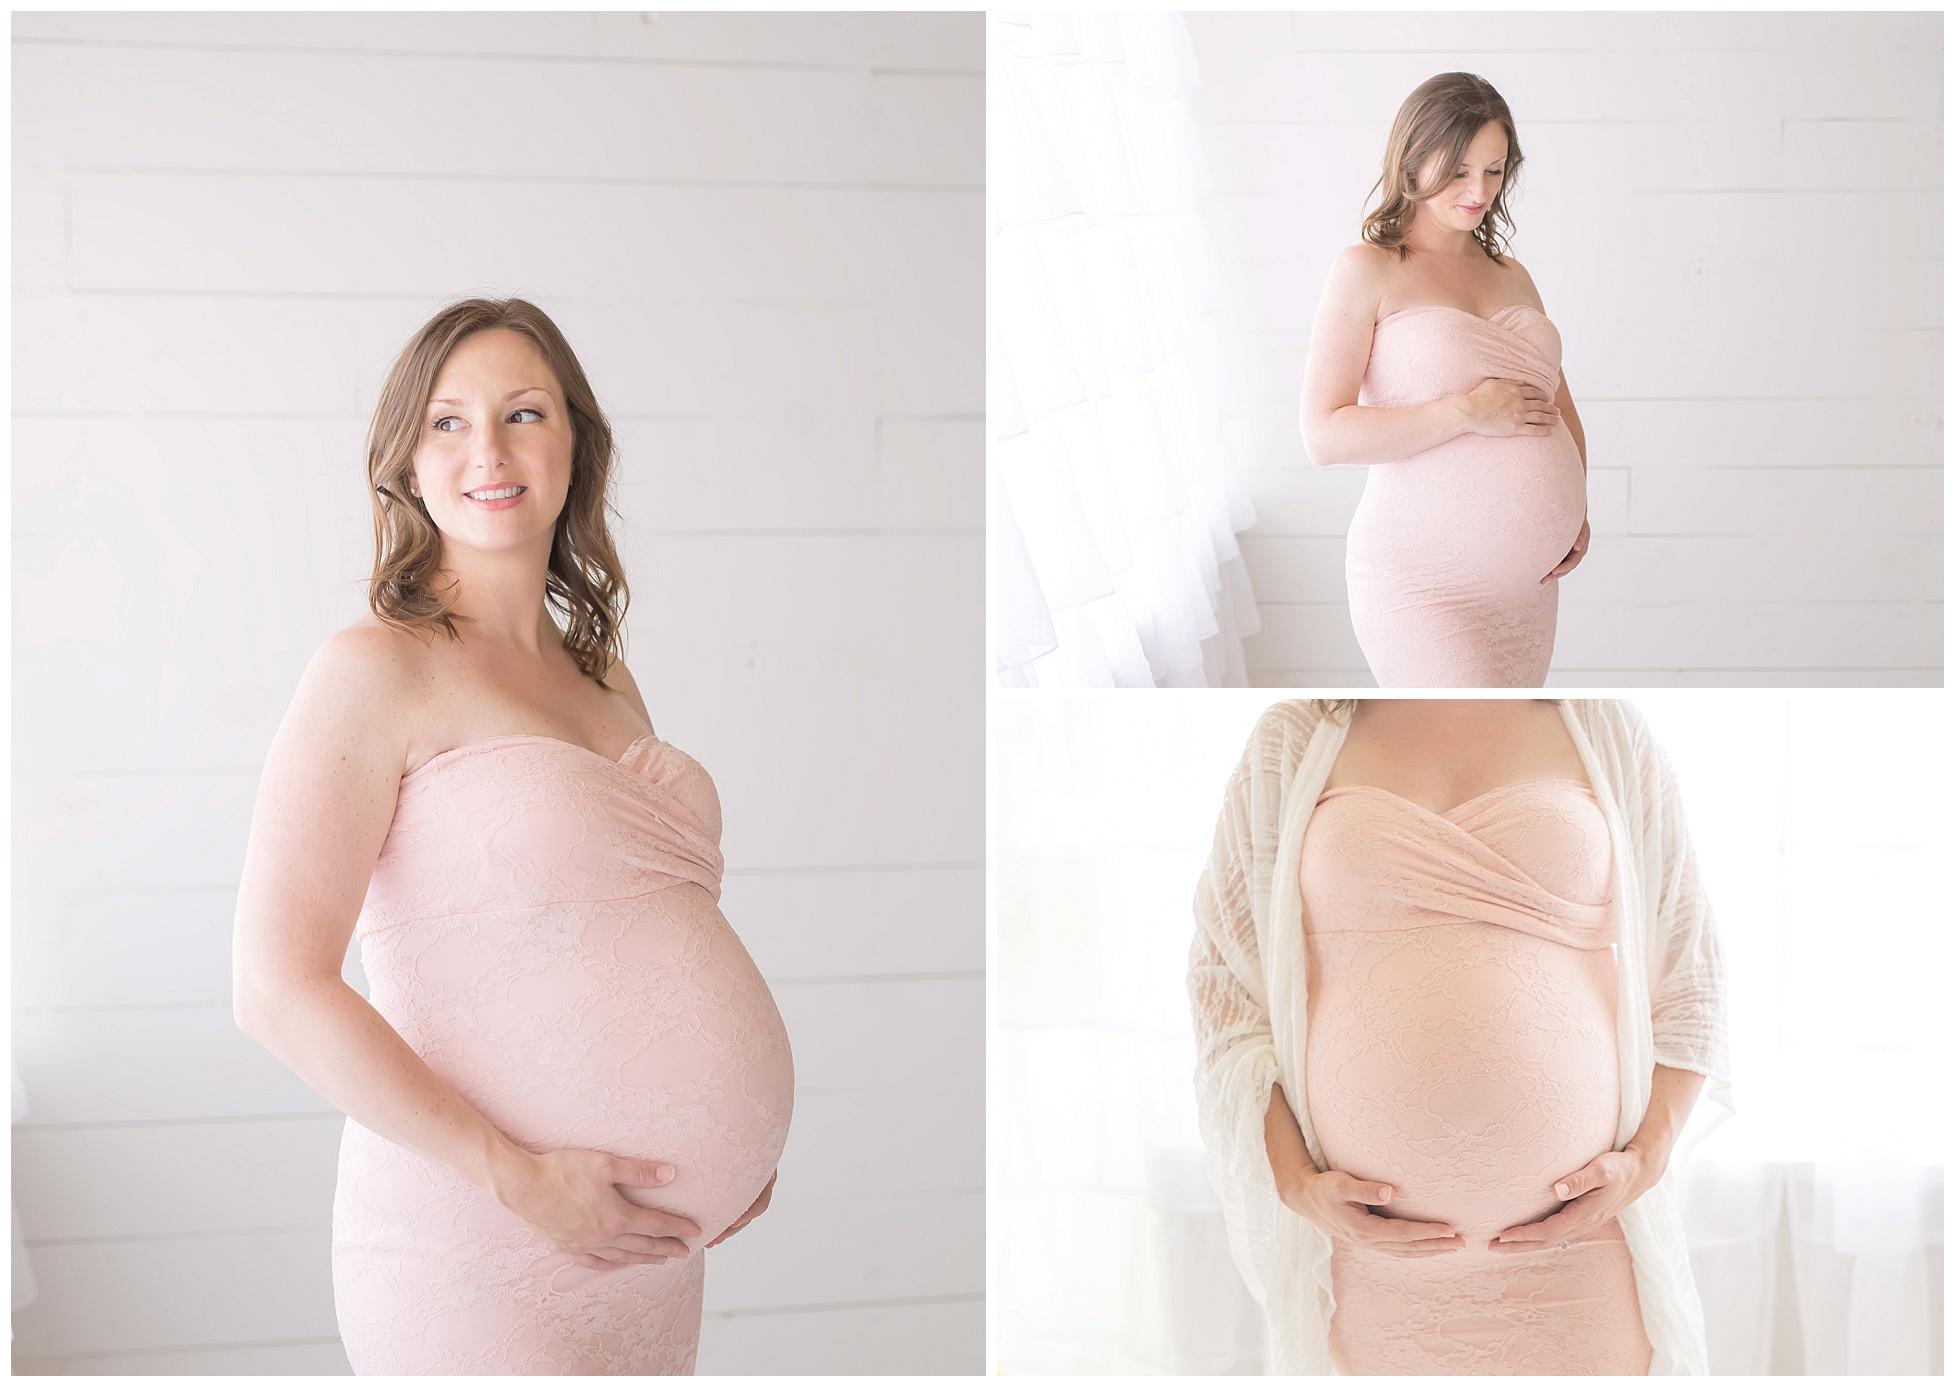 St. Simon's Island Maternity Photographer | Candace Hires Photography | www.candacehiresphotography.com